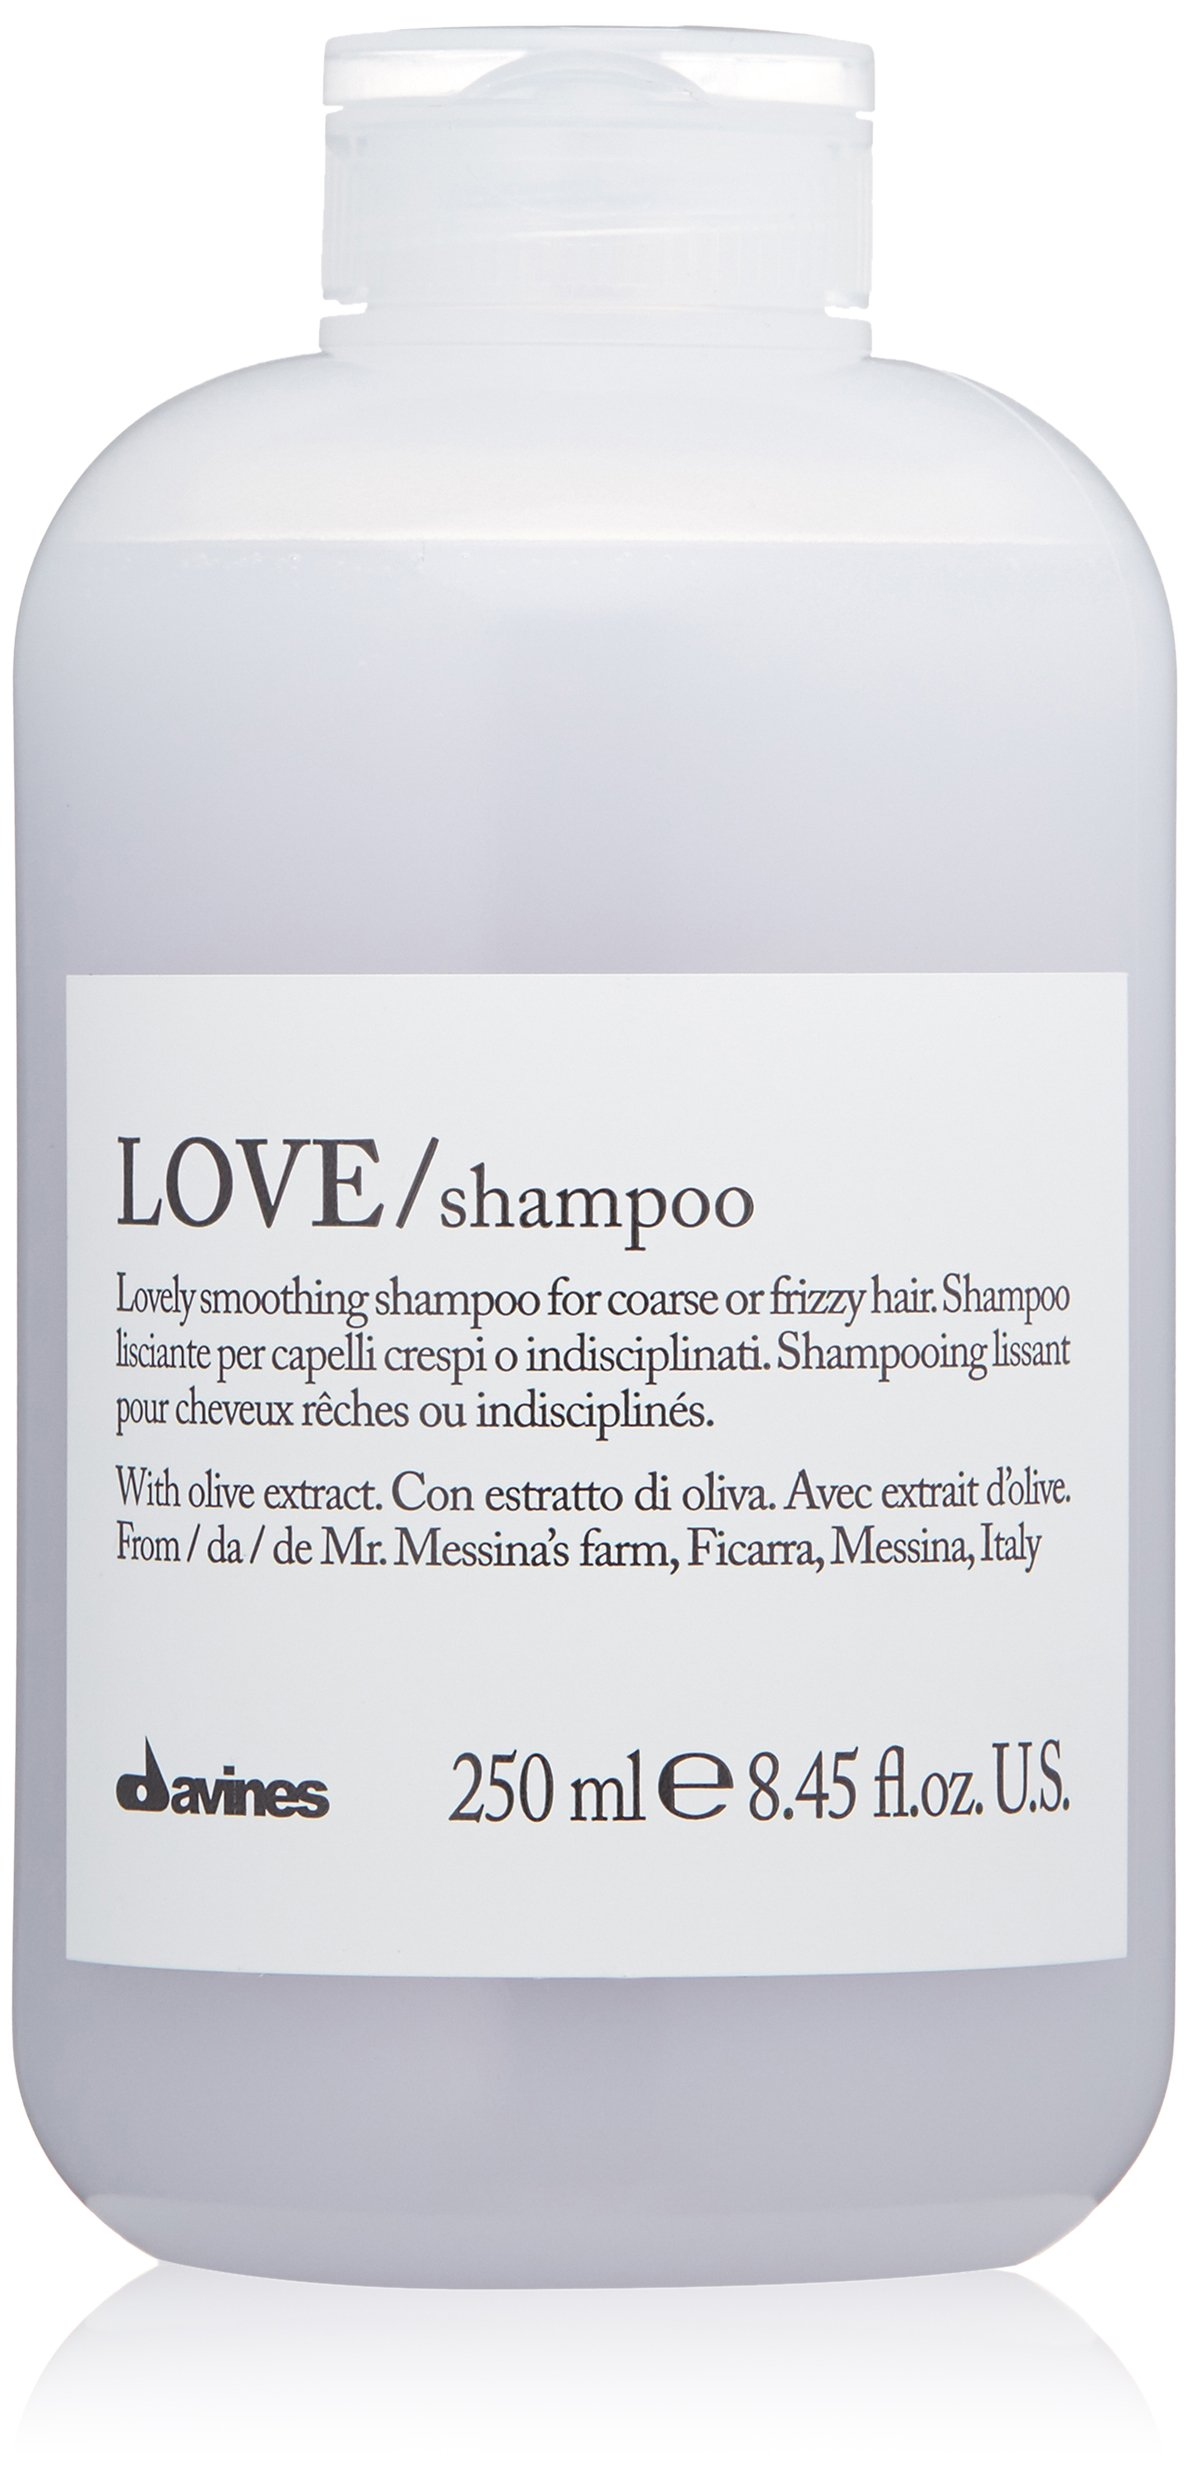 Davines Love Smoothing Shampoo, 8.45 fl.oz. by Davines